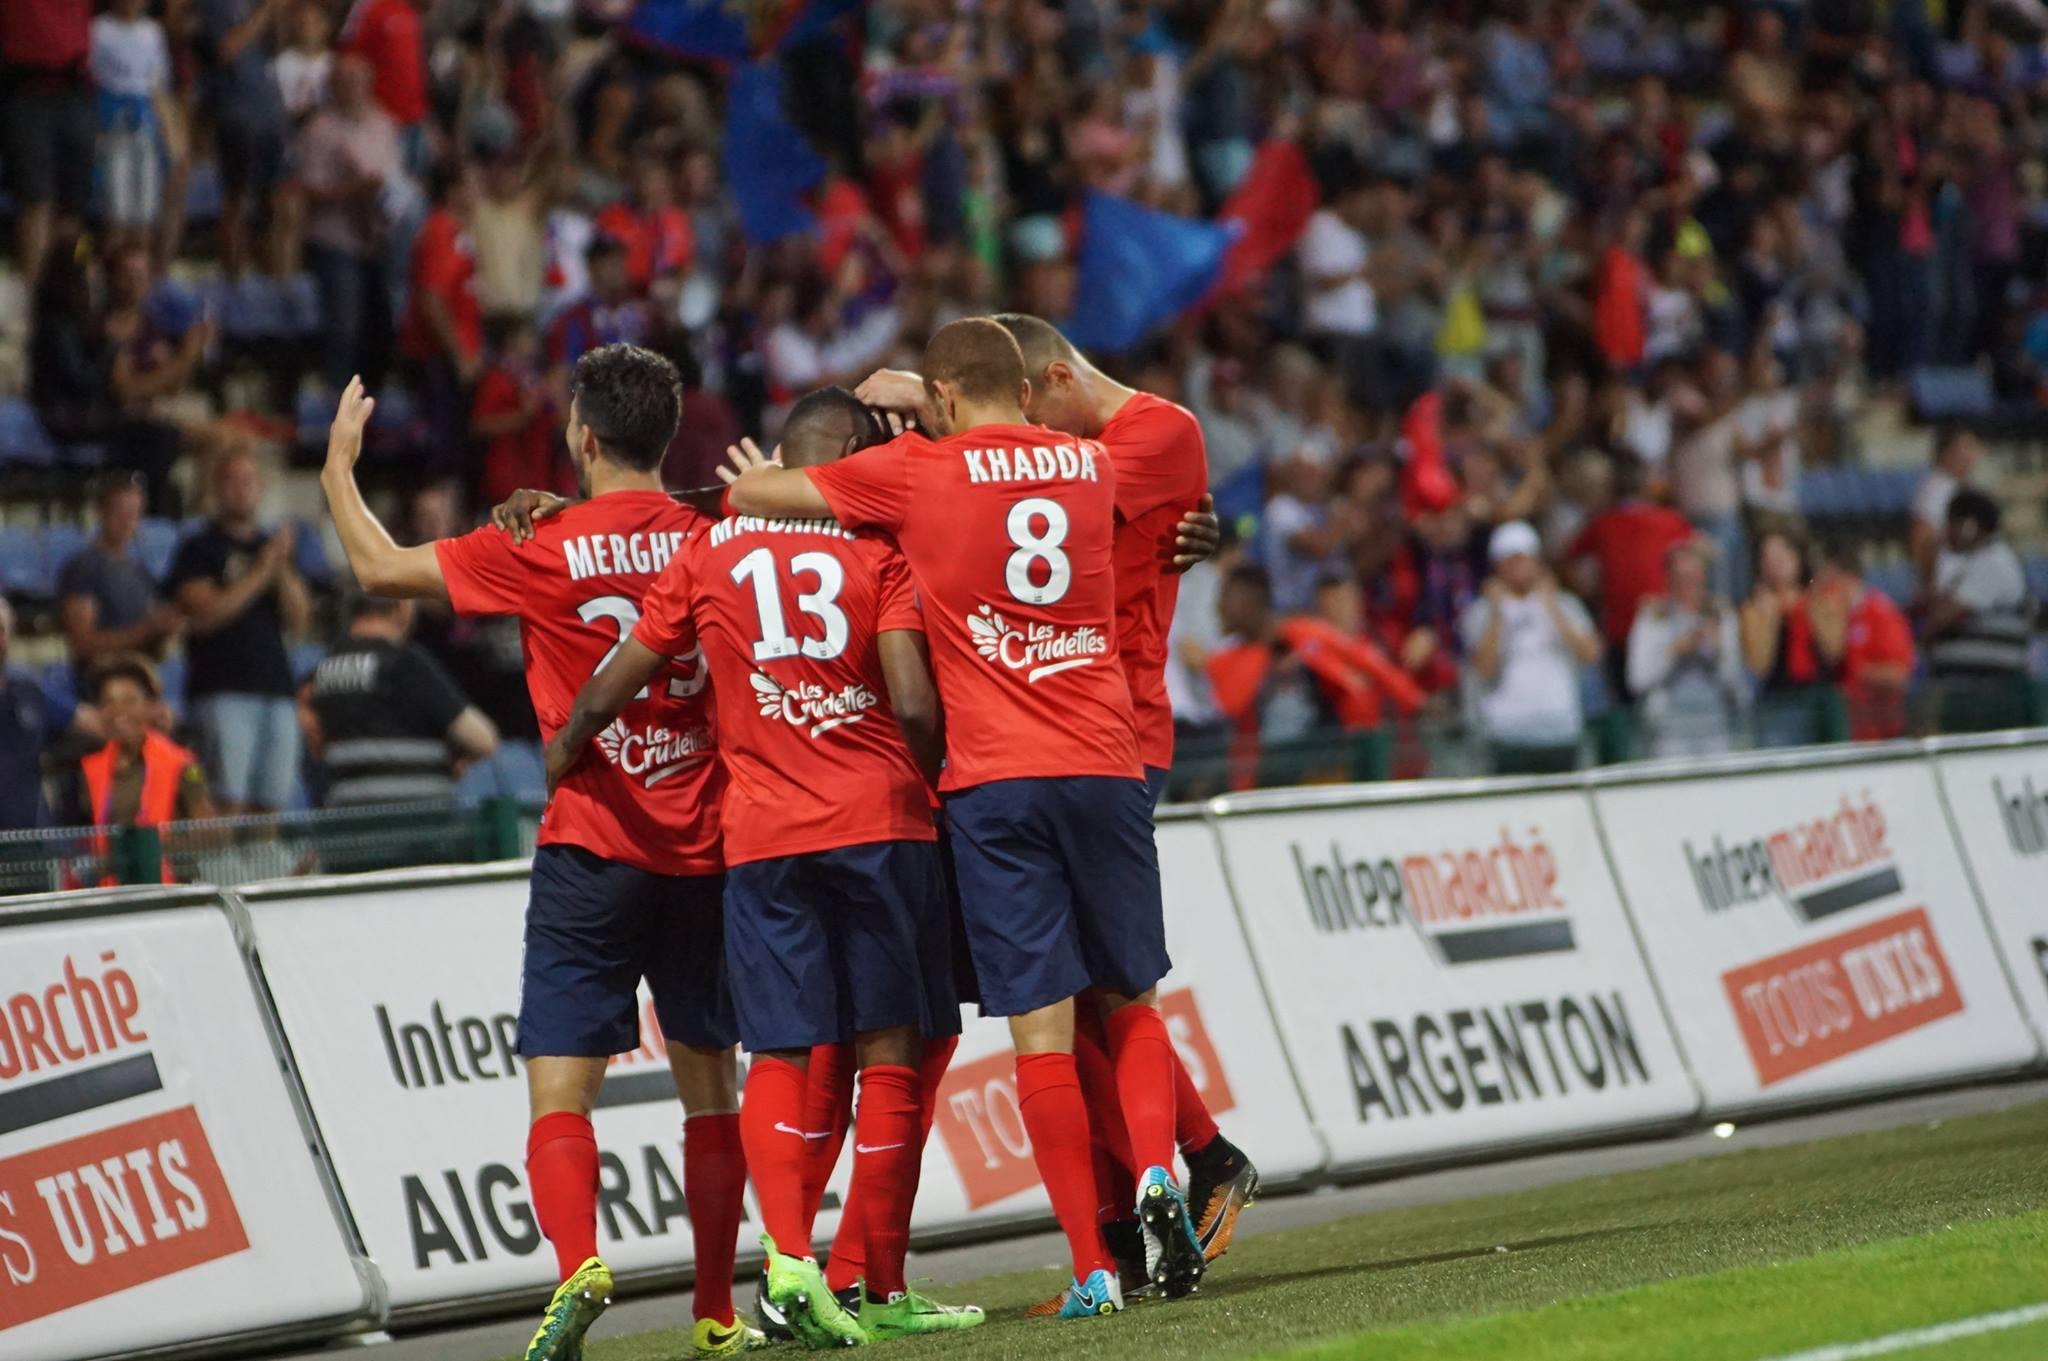 Pronostico Rodez-Chateauroux 10 gennaio: le quote di Ligue 2